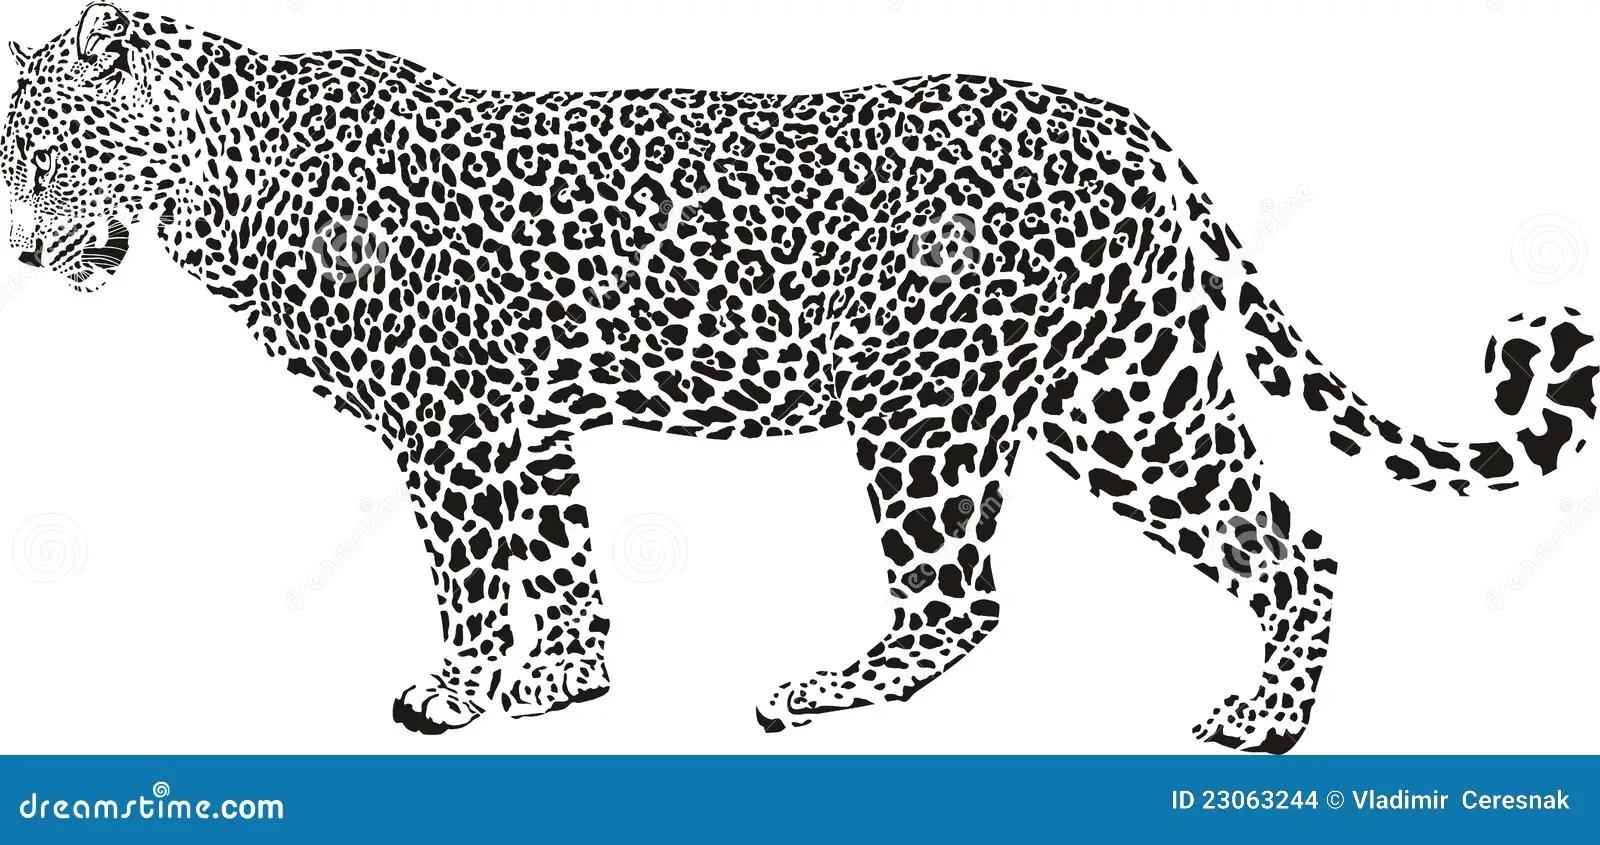 Leopard illustration stock vector. Illustration of speed